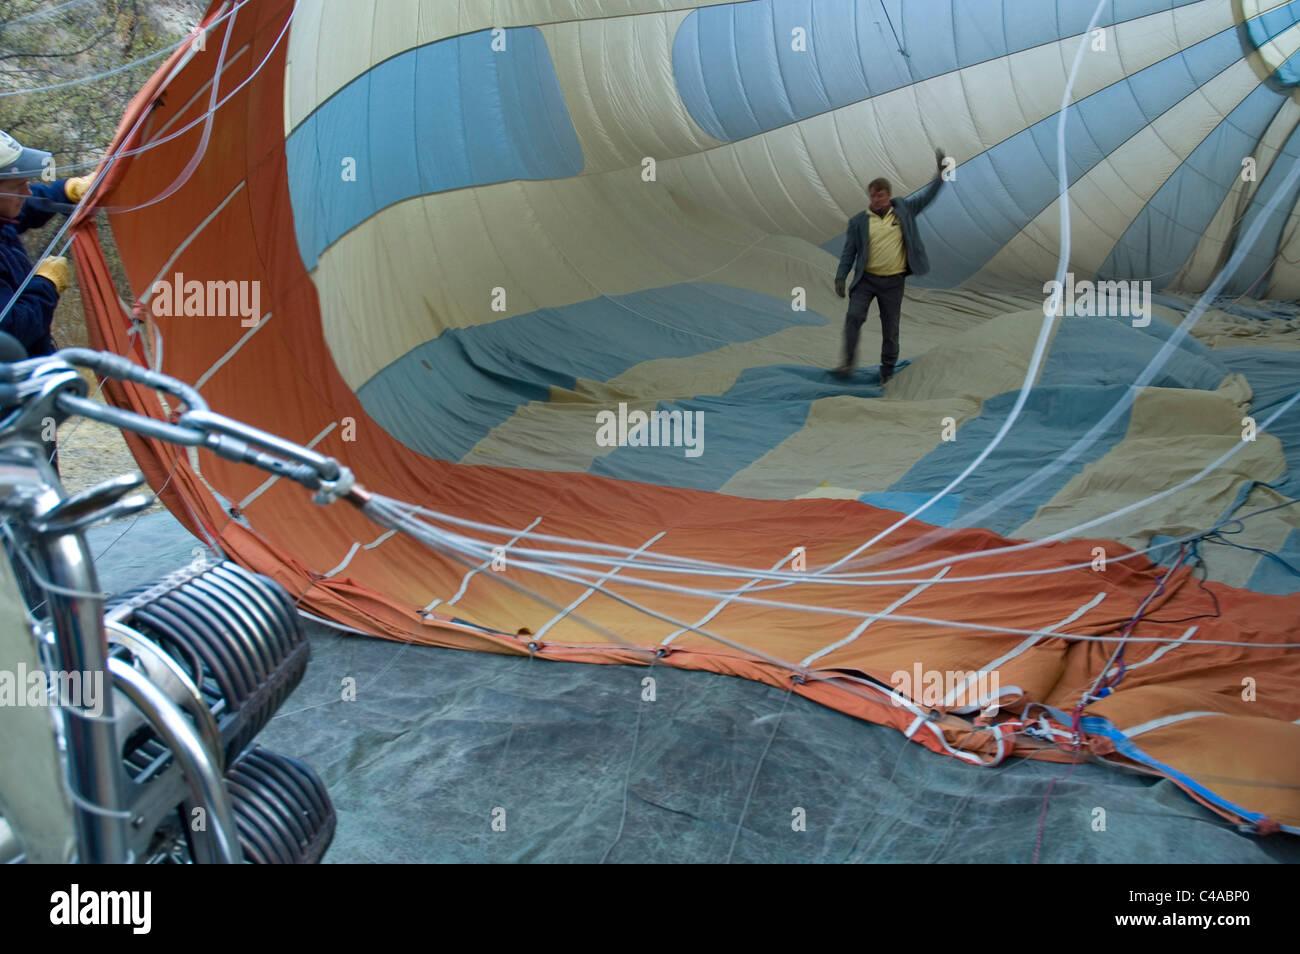 Photograph of the preflight of a hot air balloon in Kapadokya Turkey - Stock Image